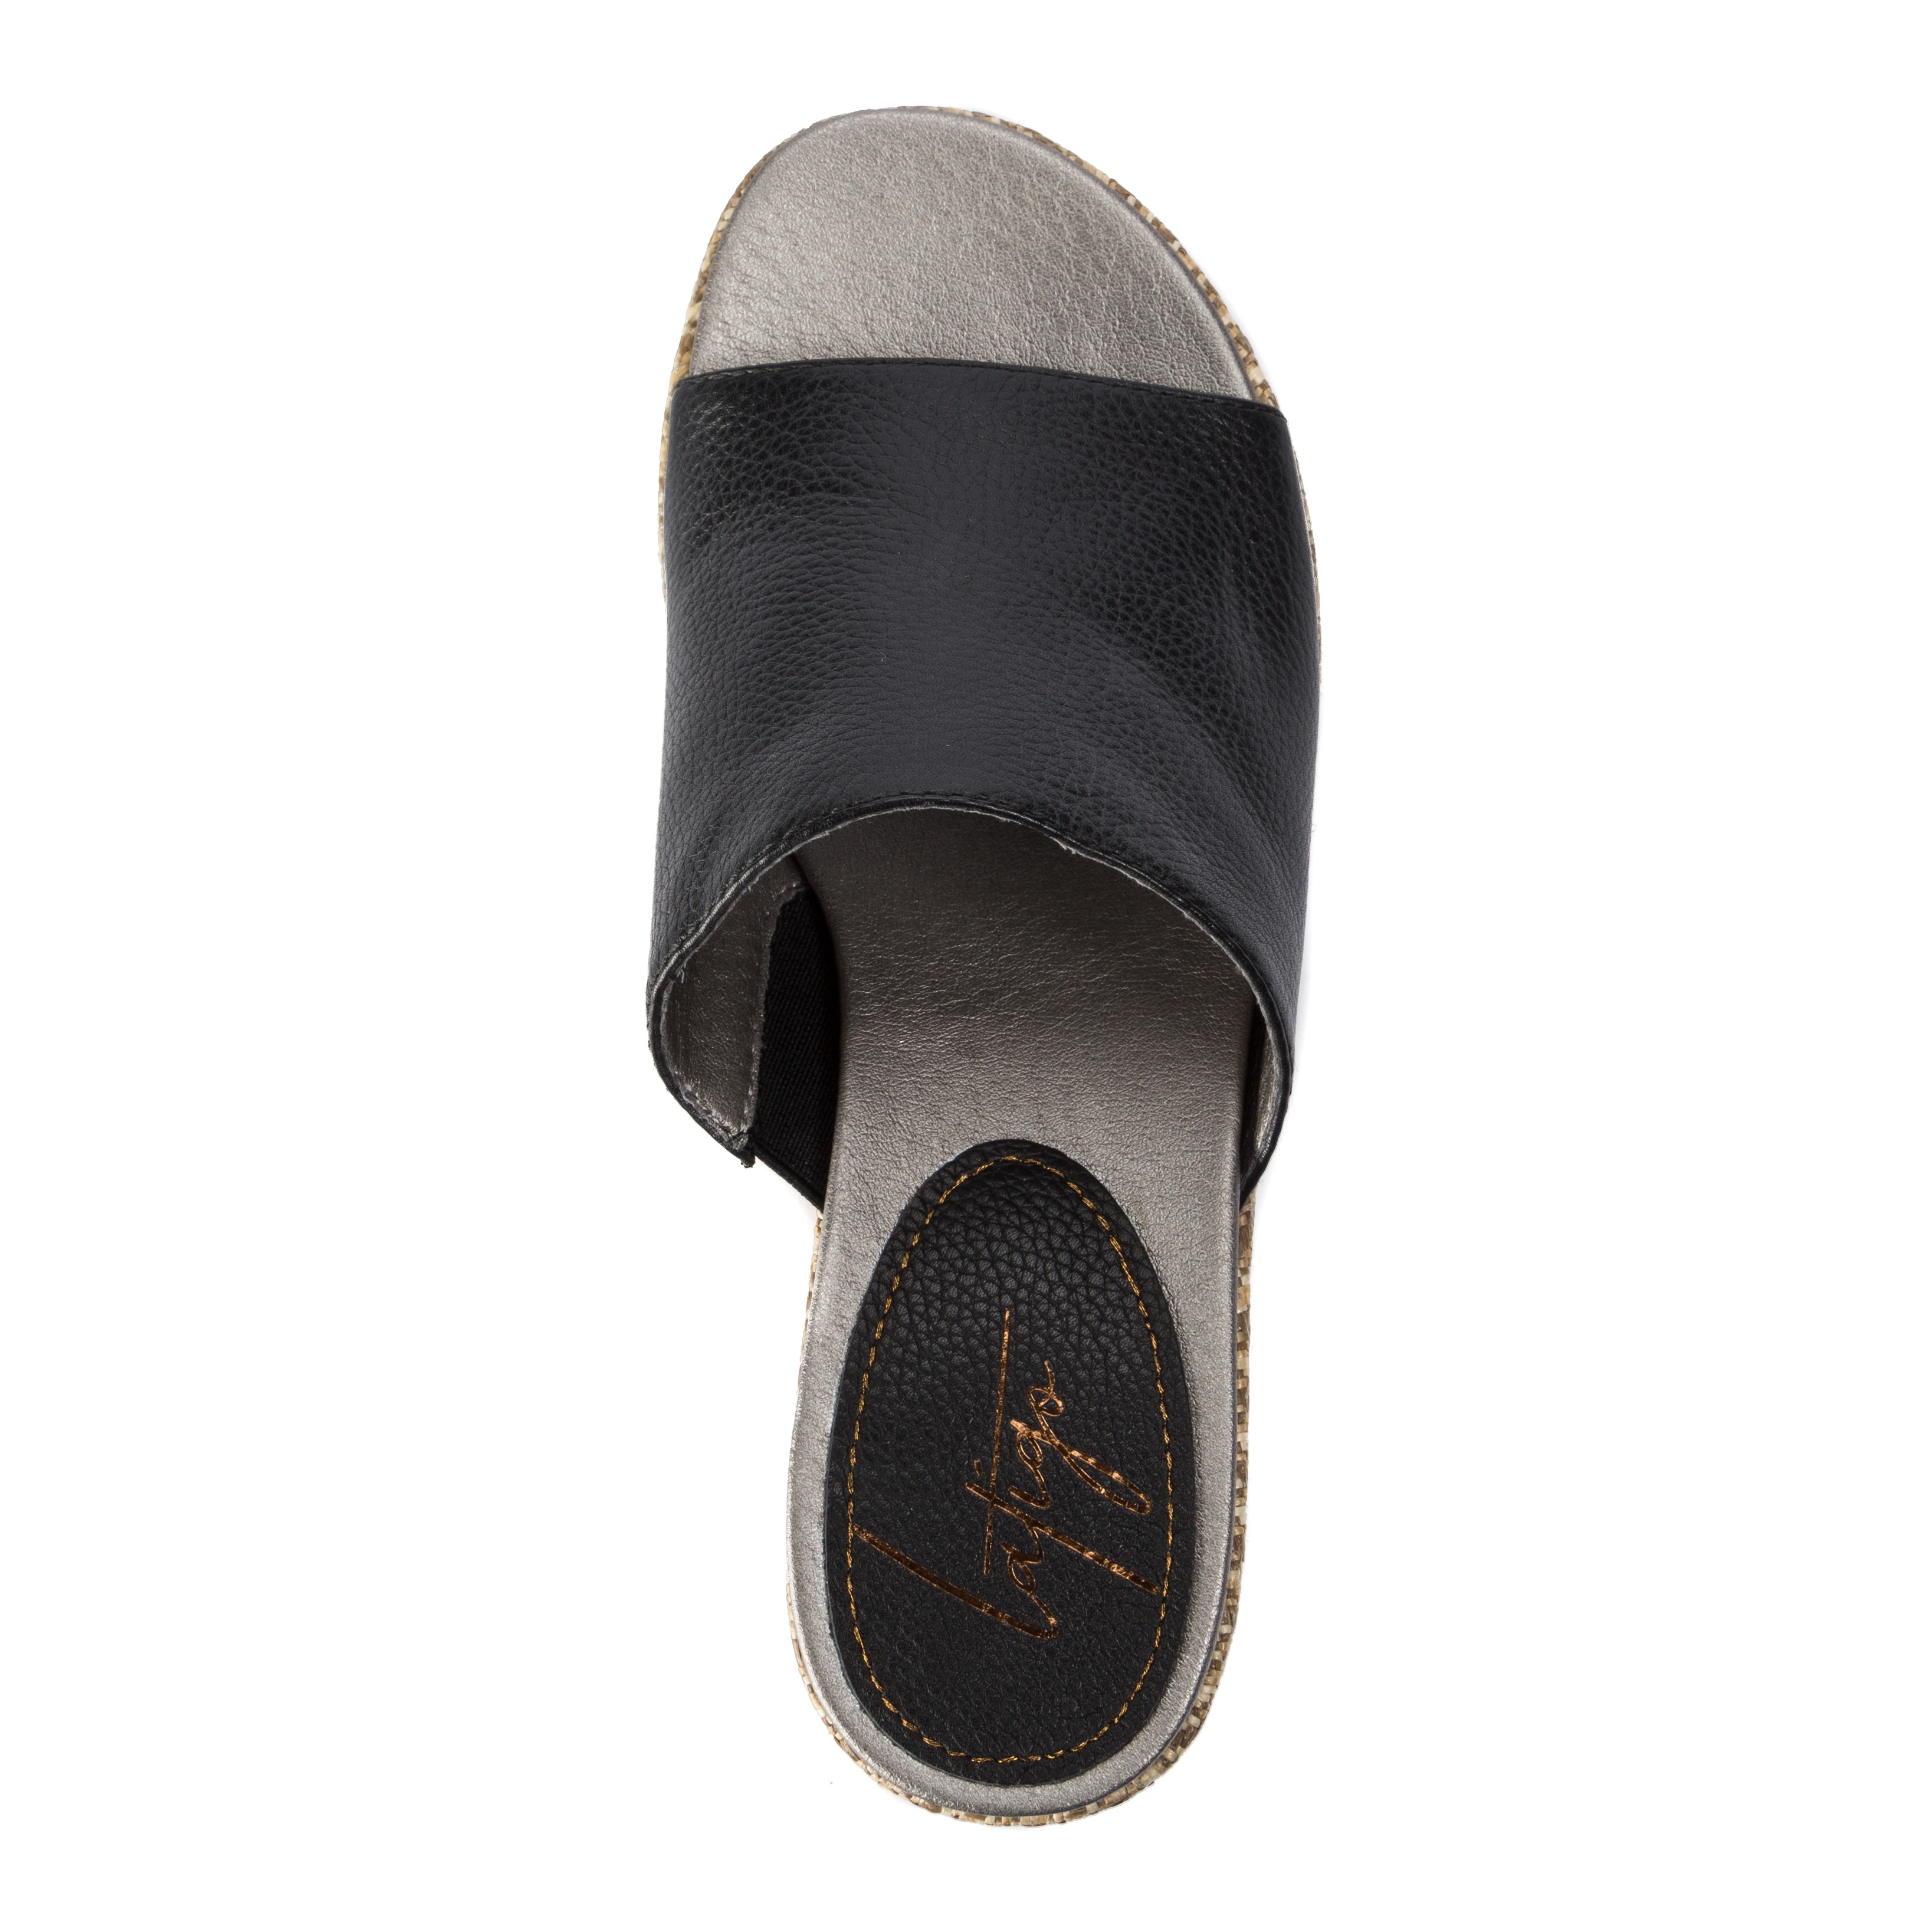 d136c5526a4 Shop Latigo Letitia Women s Sandals Black - Free Shipping Today - Overstock  - 27337323